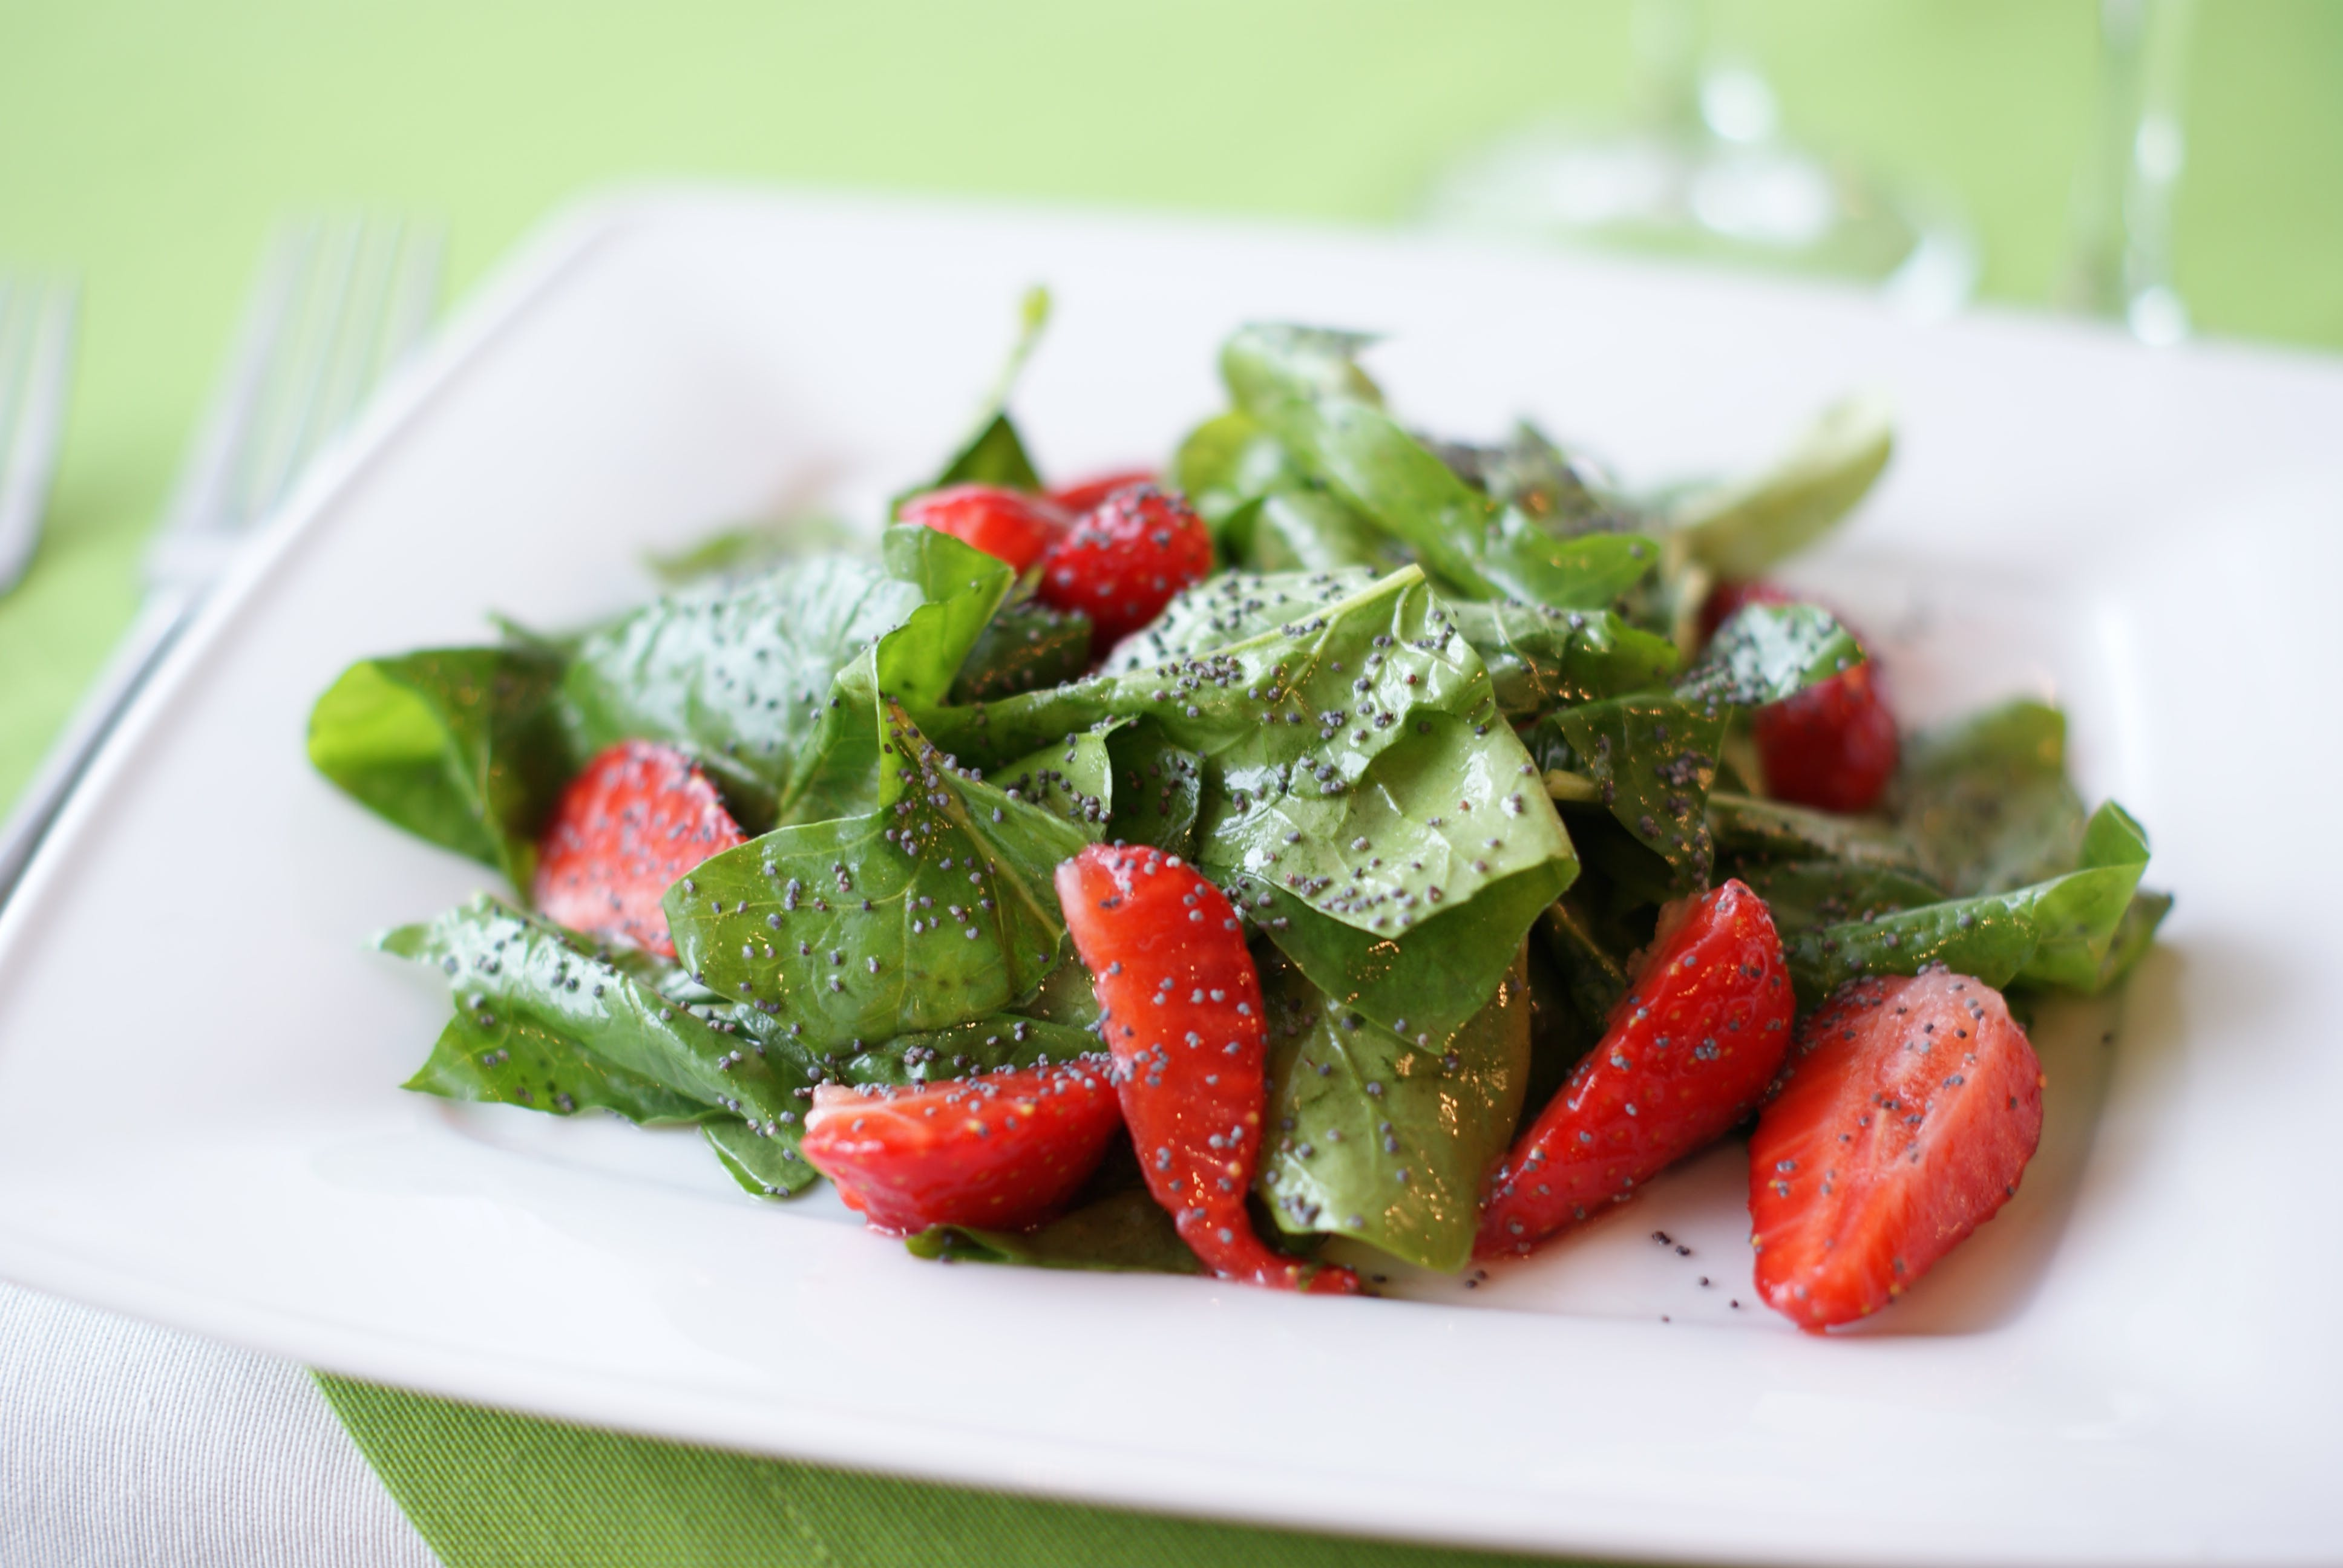 Foto stok gratis buah, Epikur, lezat, makanan